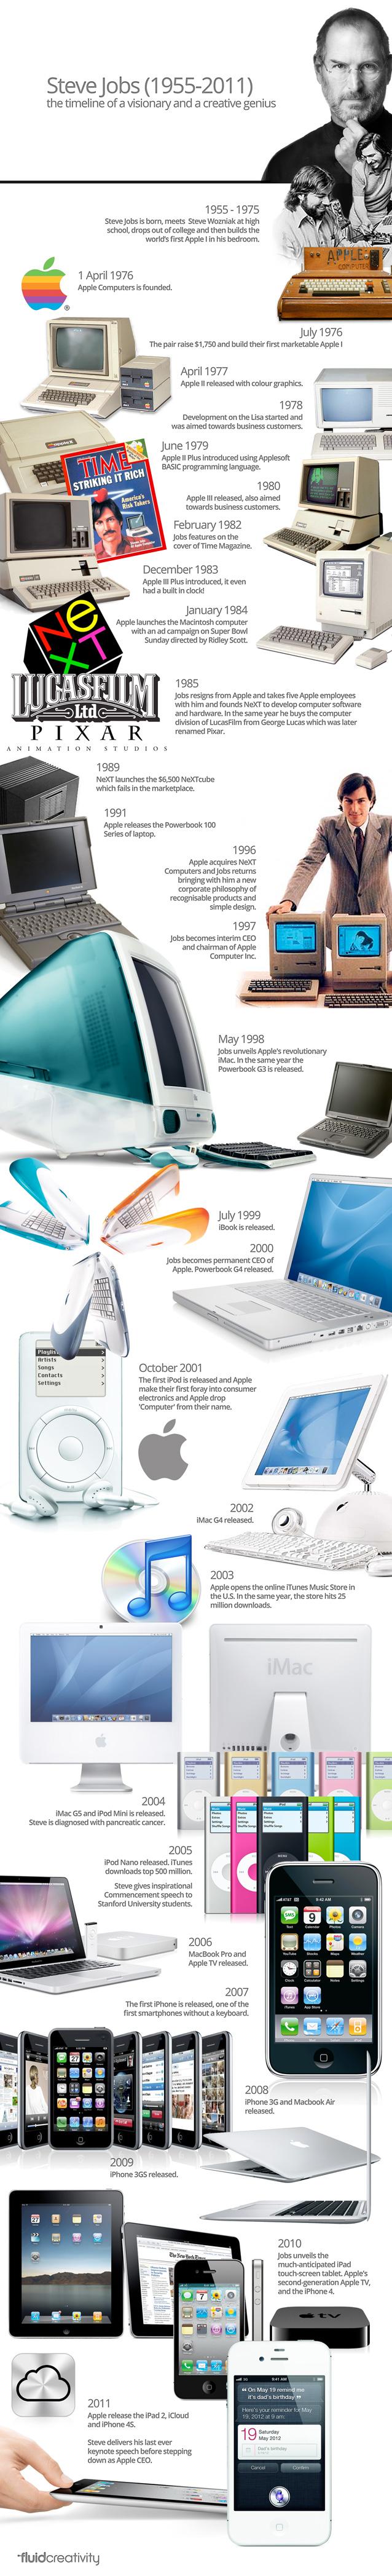 Steve Jobs, the Timeline